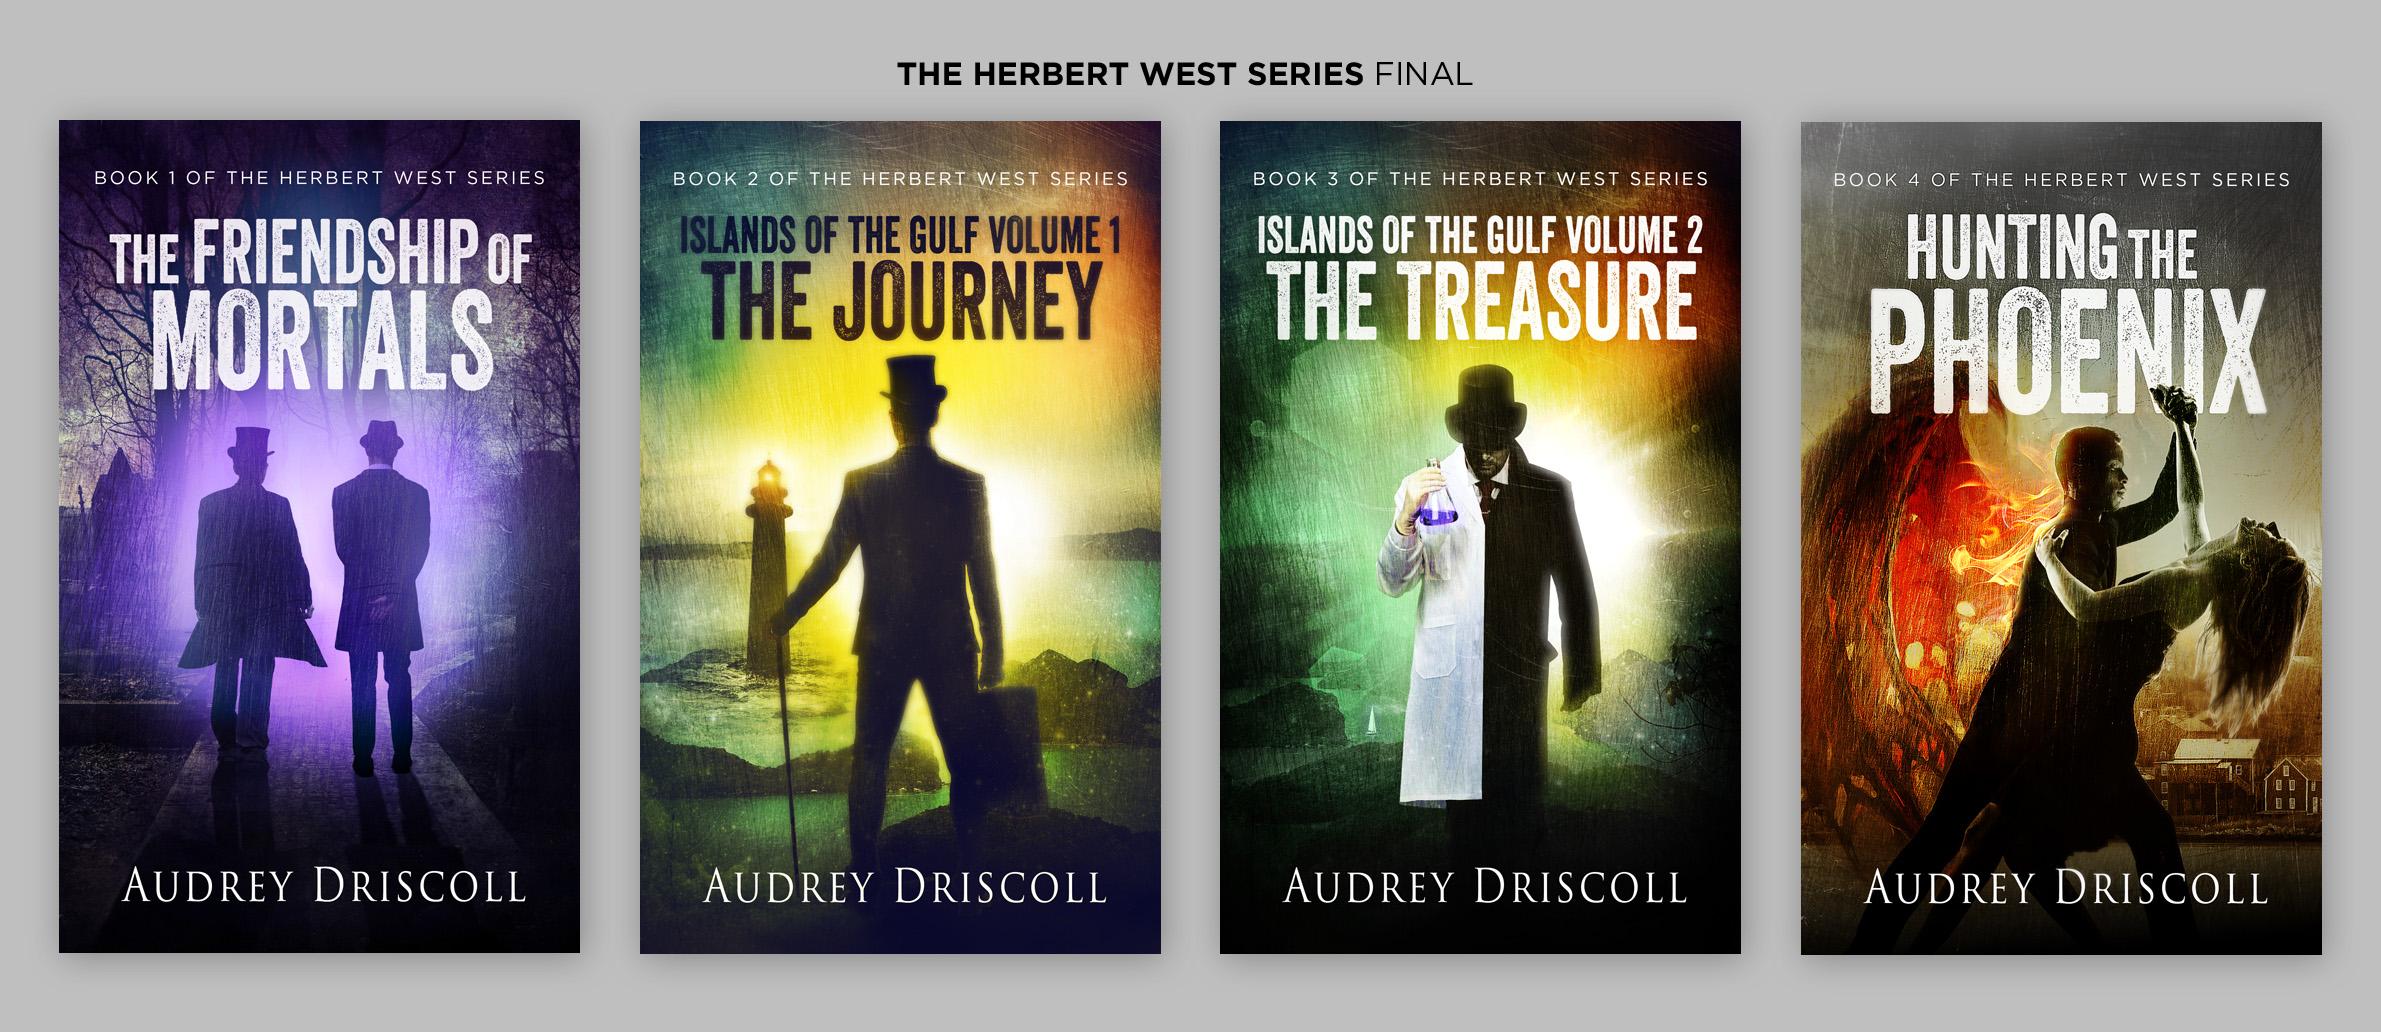 Free ebooks audrey driscolls blog the herbert west seriesfinal fandeluxe Images